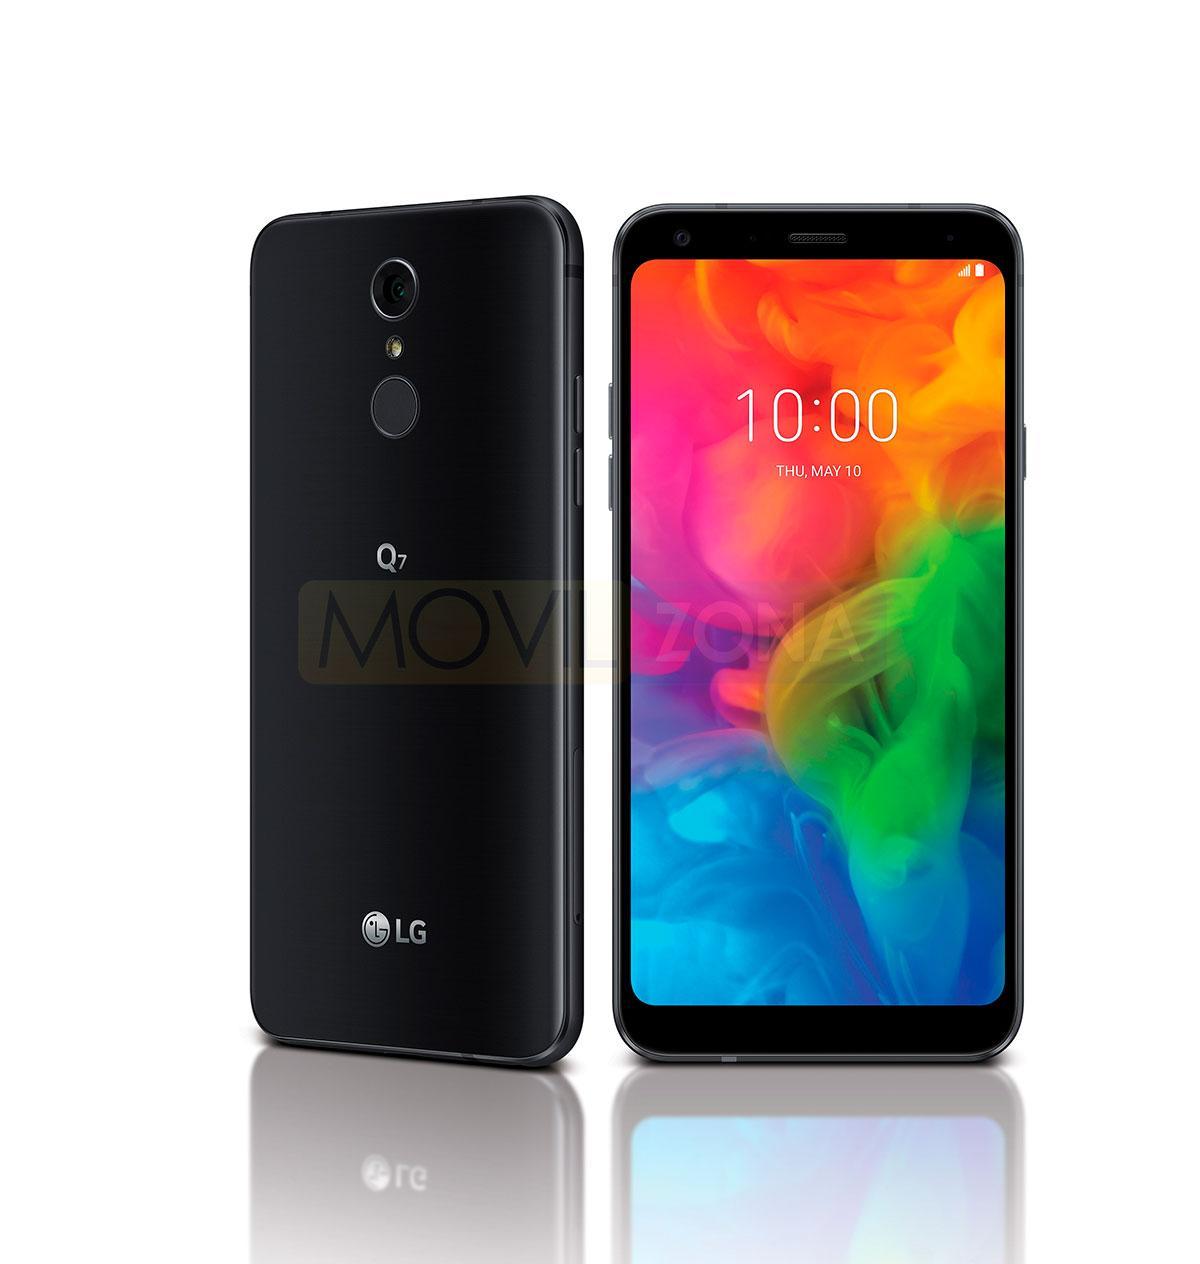 LG Q7 negro con Android